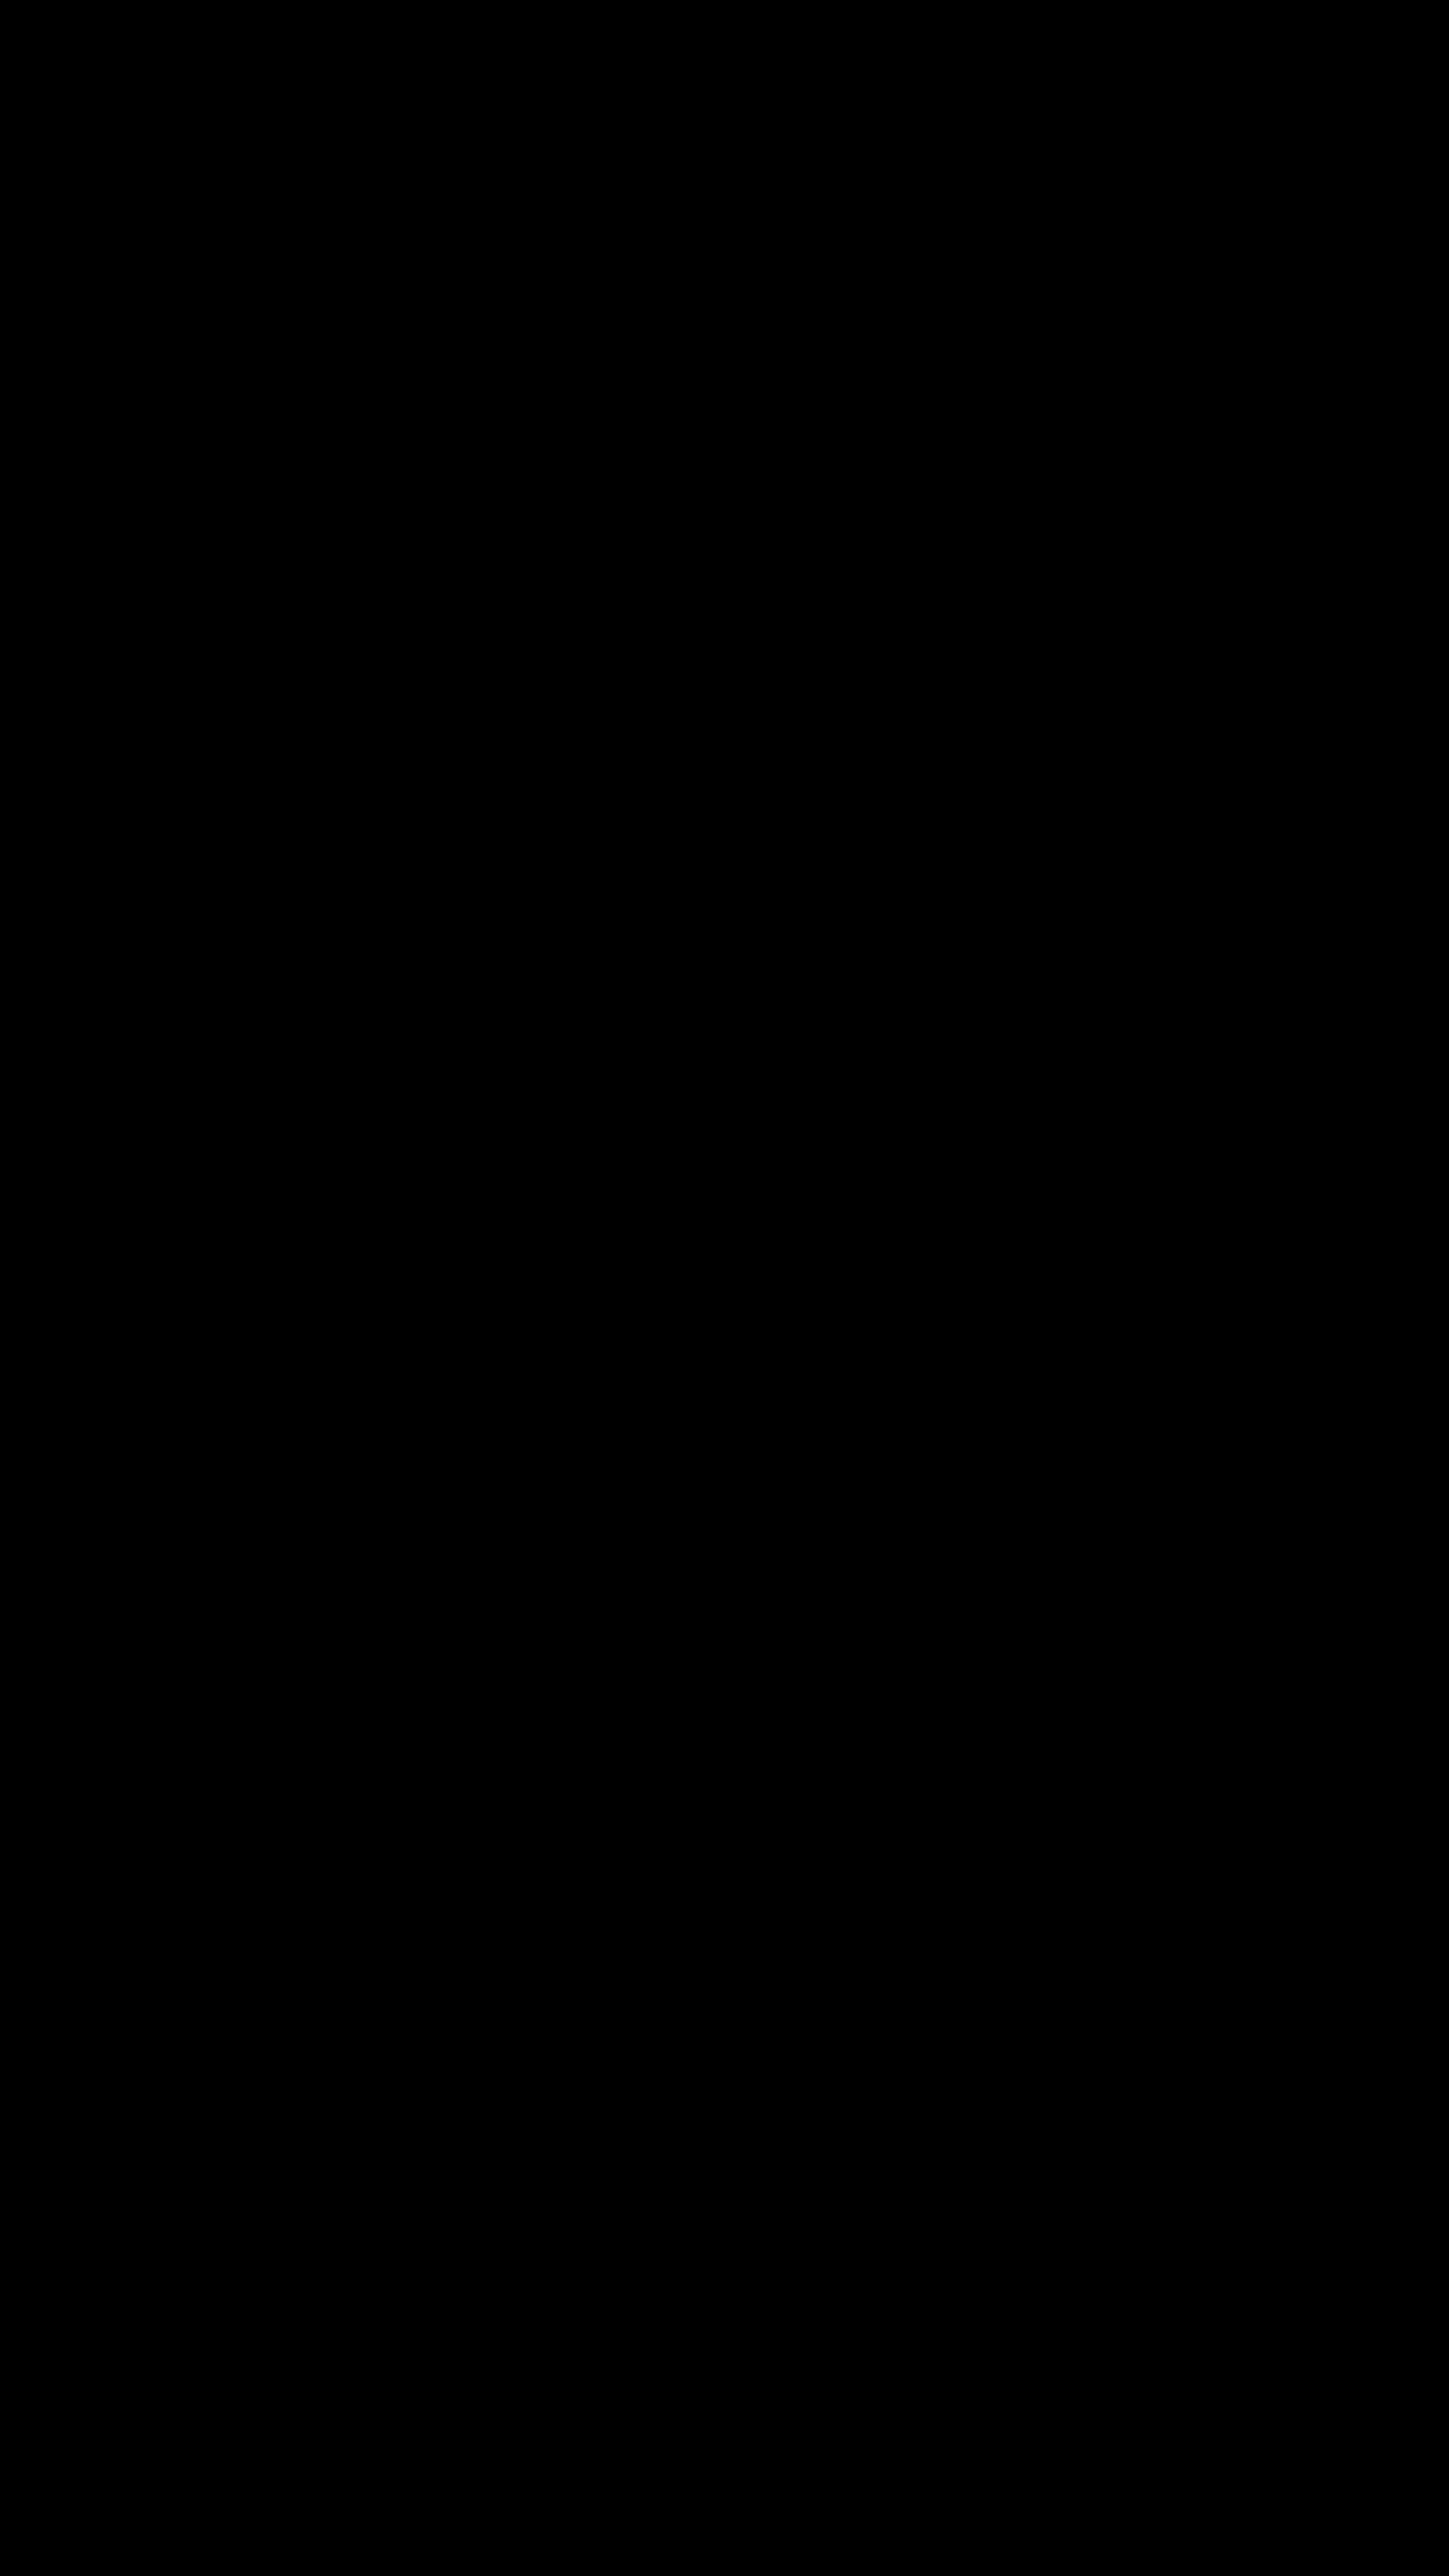 LAMPA MOTOSİKLET KALDIRMA TAKOZU (10mm)